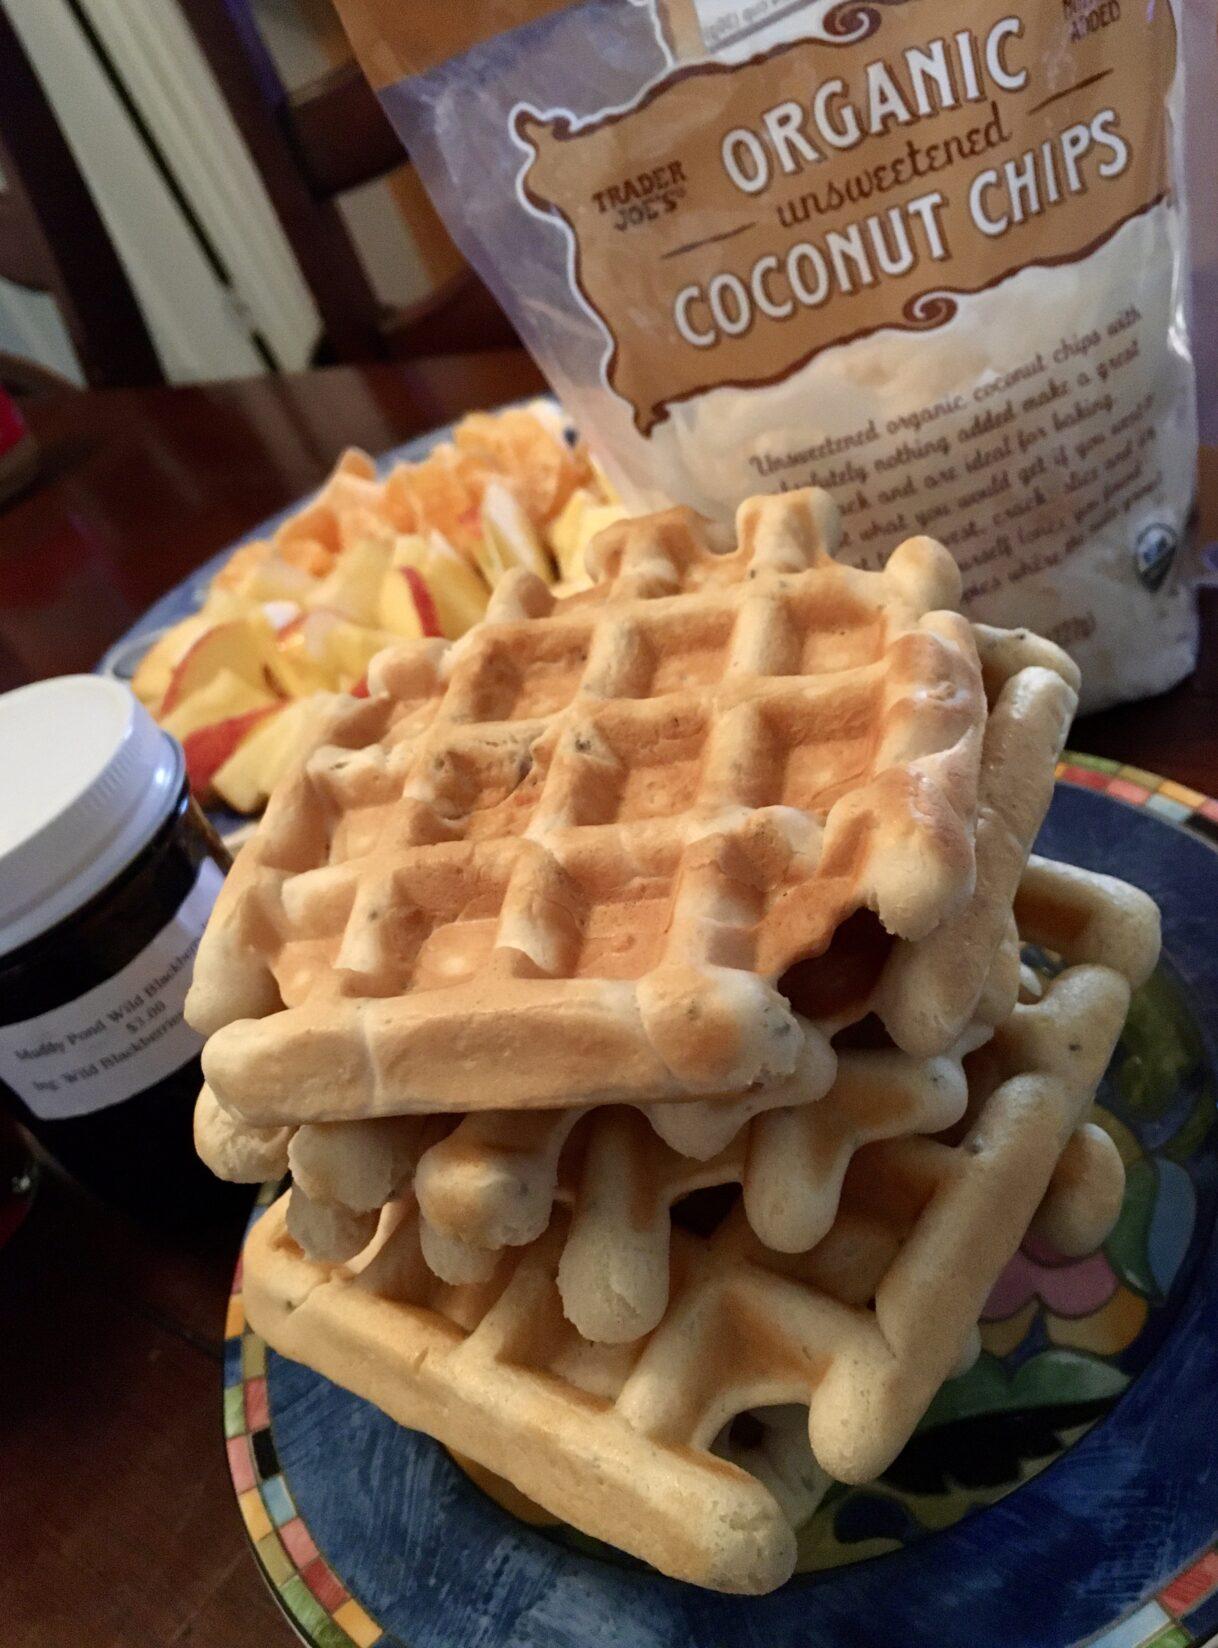 Homemade Vegan Waffles with Cranberry Syrup, Blackberry Jam, and Fruit – Athens, Georgia 12/21/2020